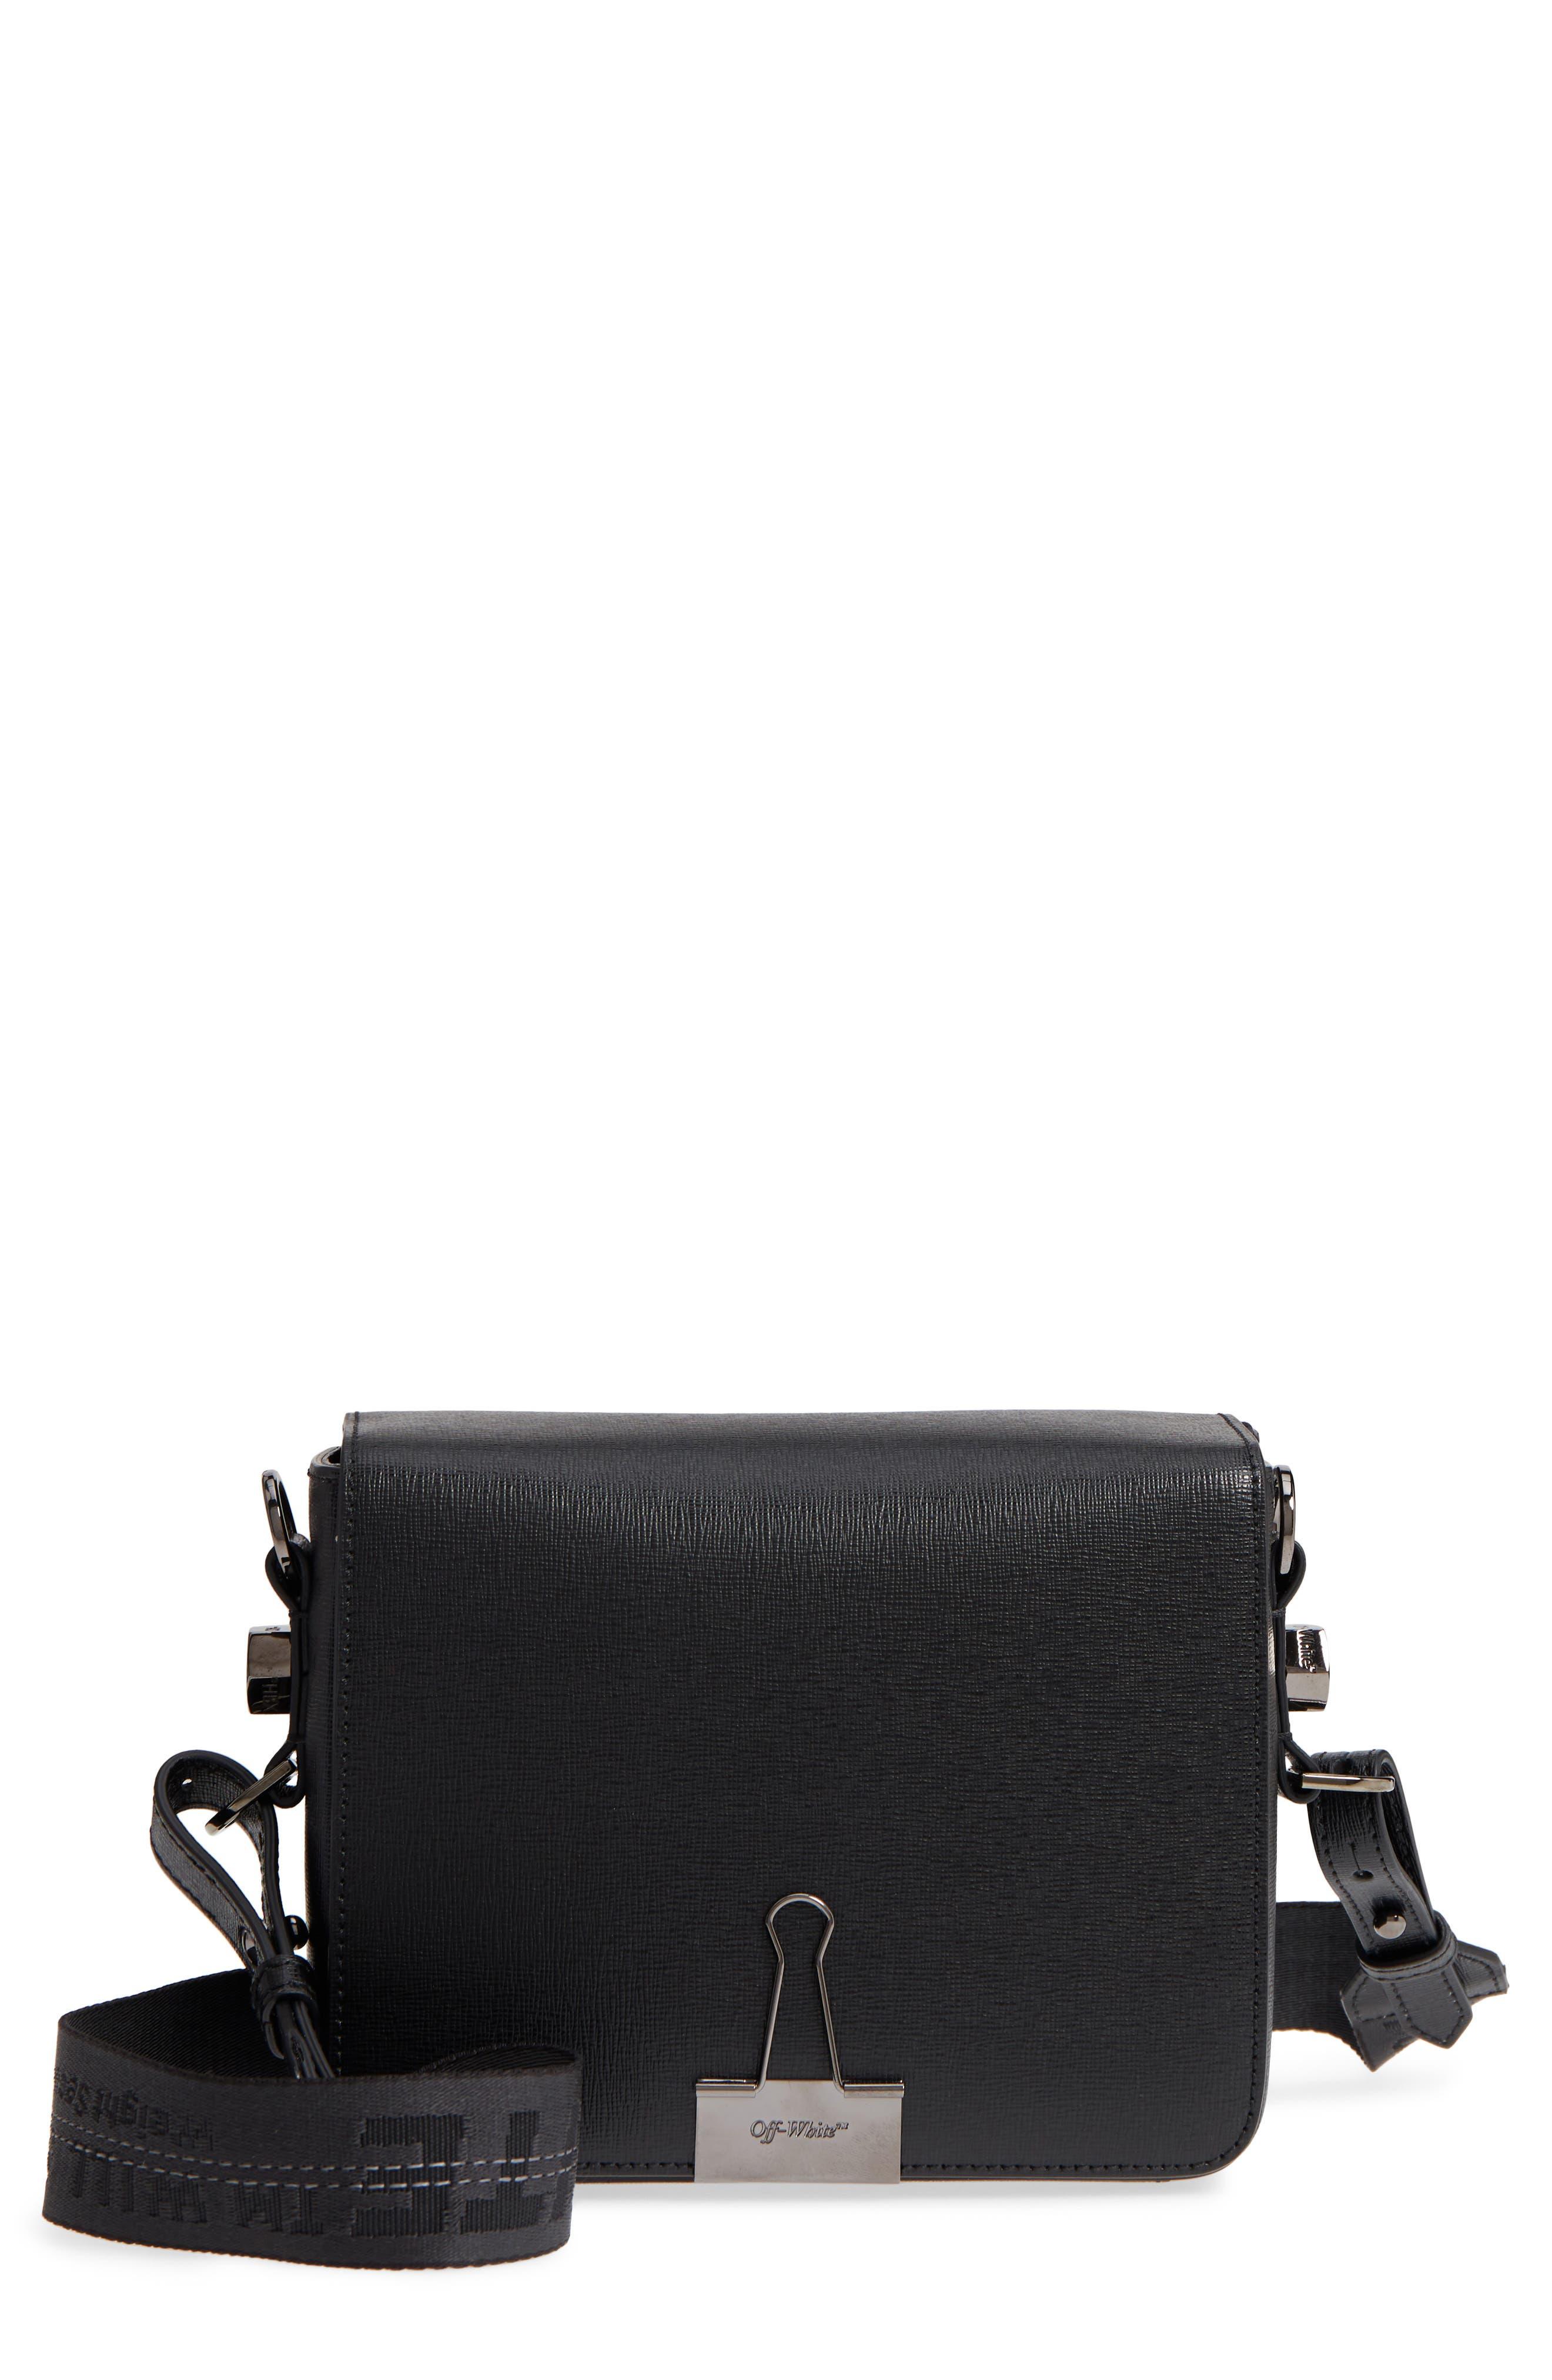 Binder Clip Leather Flap Bag,                             Main thumbnail 1, color,                             Black